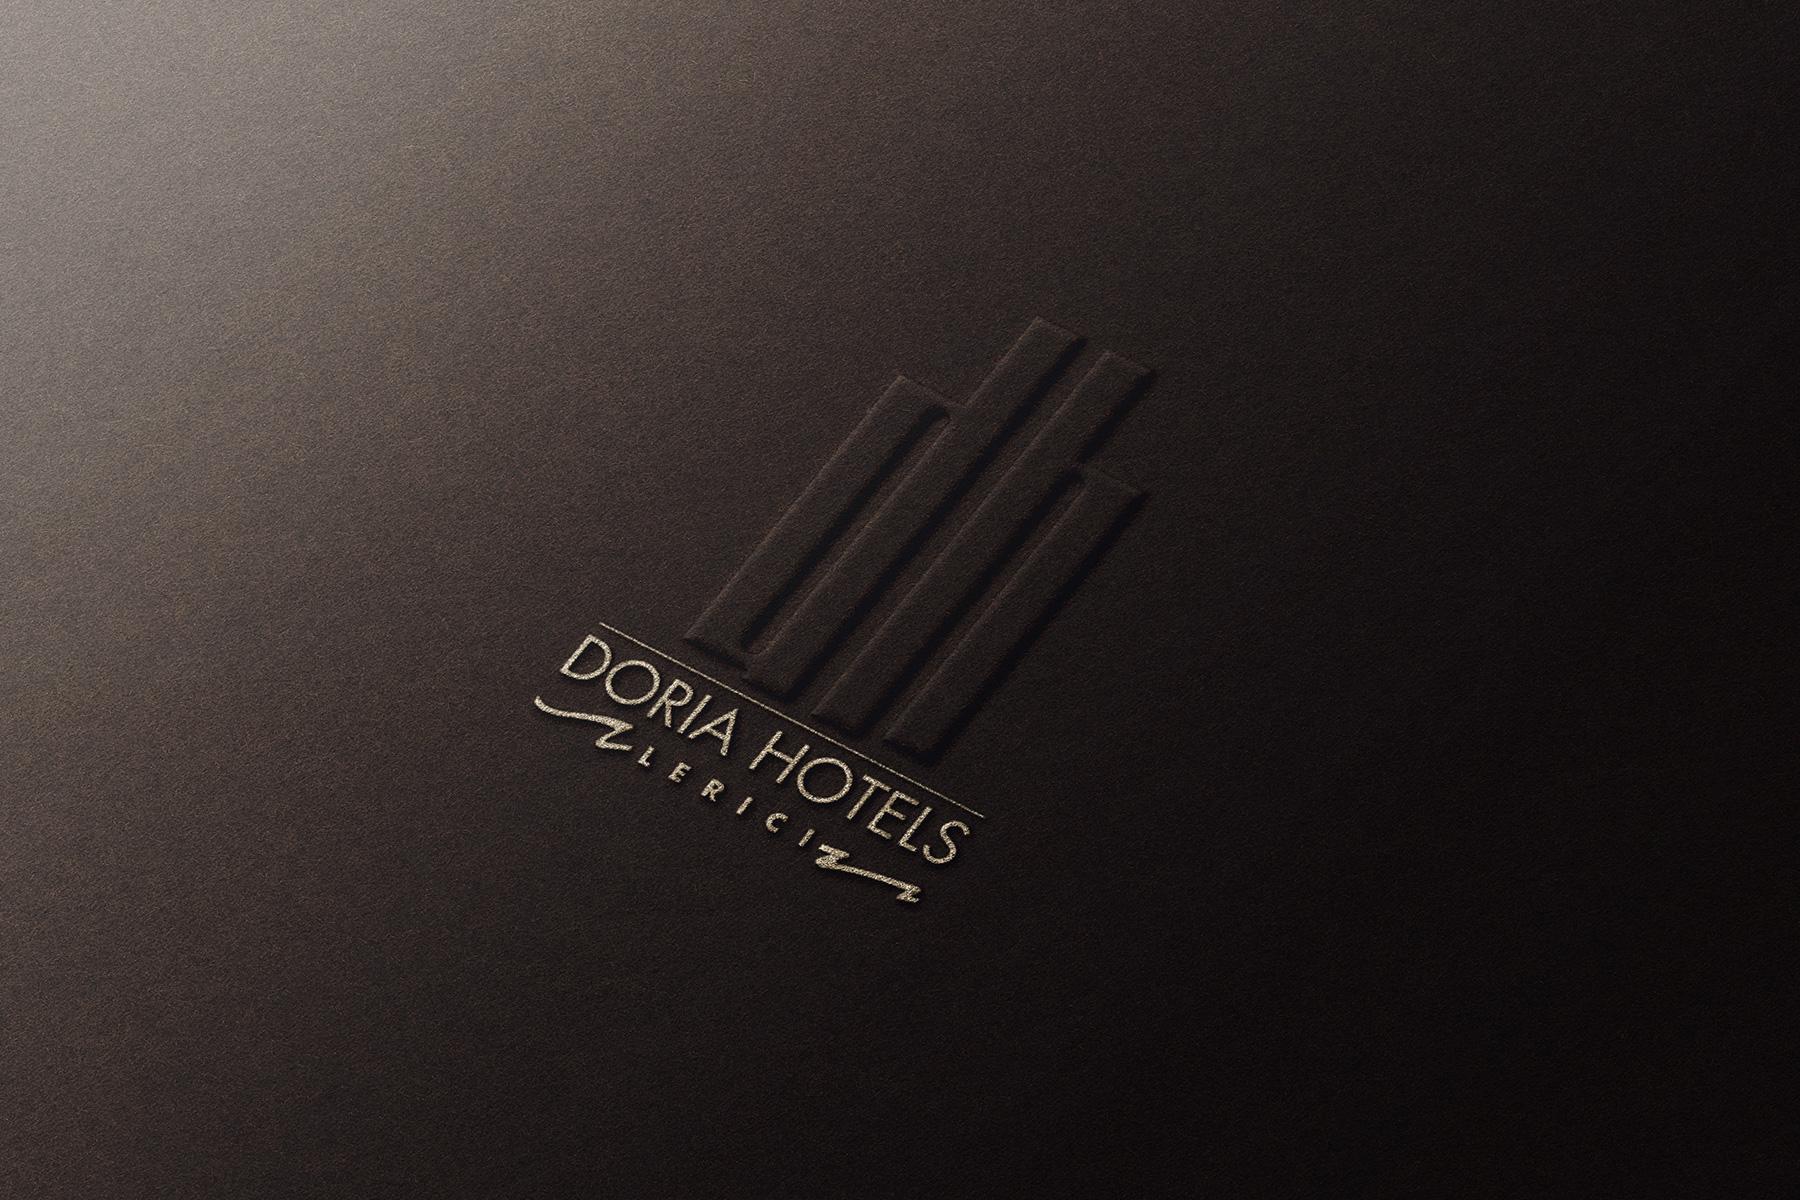 Doria_cover_2021_02